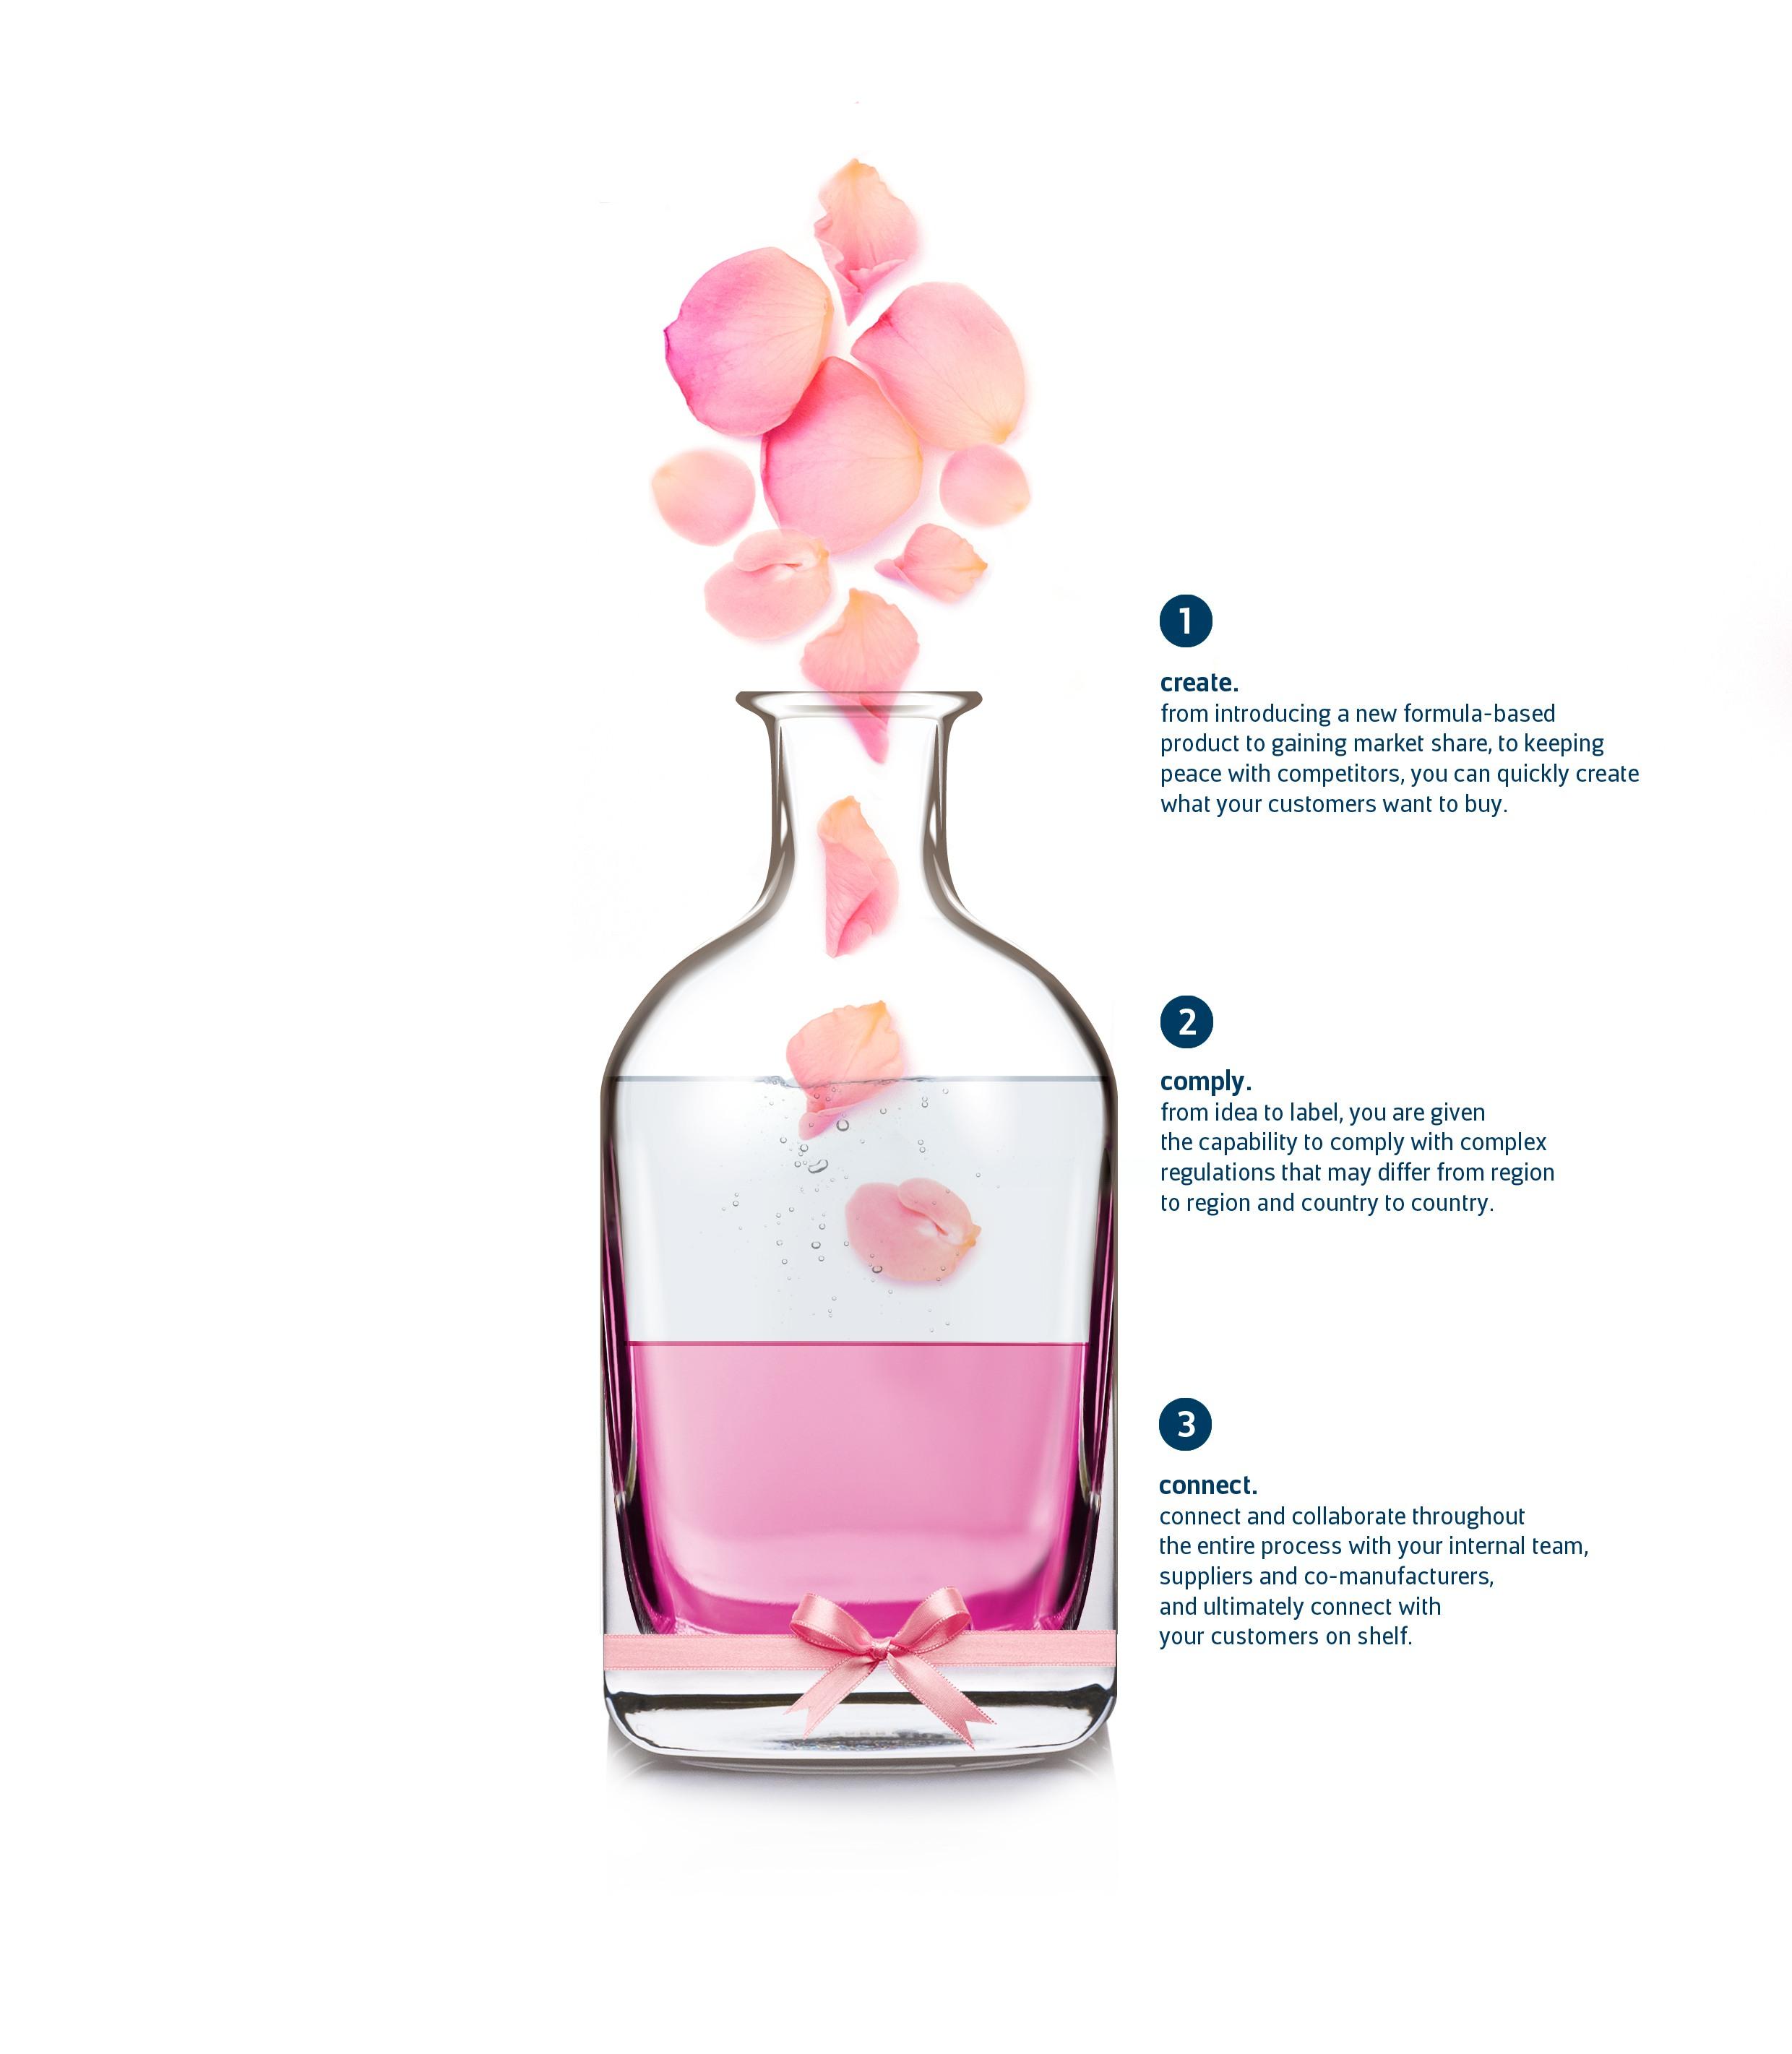 selerant_希乐仑产品生命周期管理软件-PLM-香水制造商